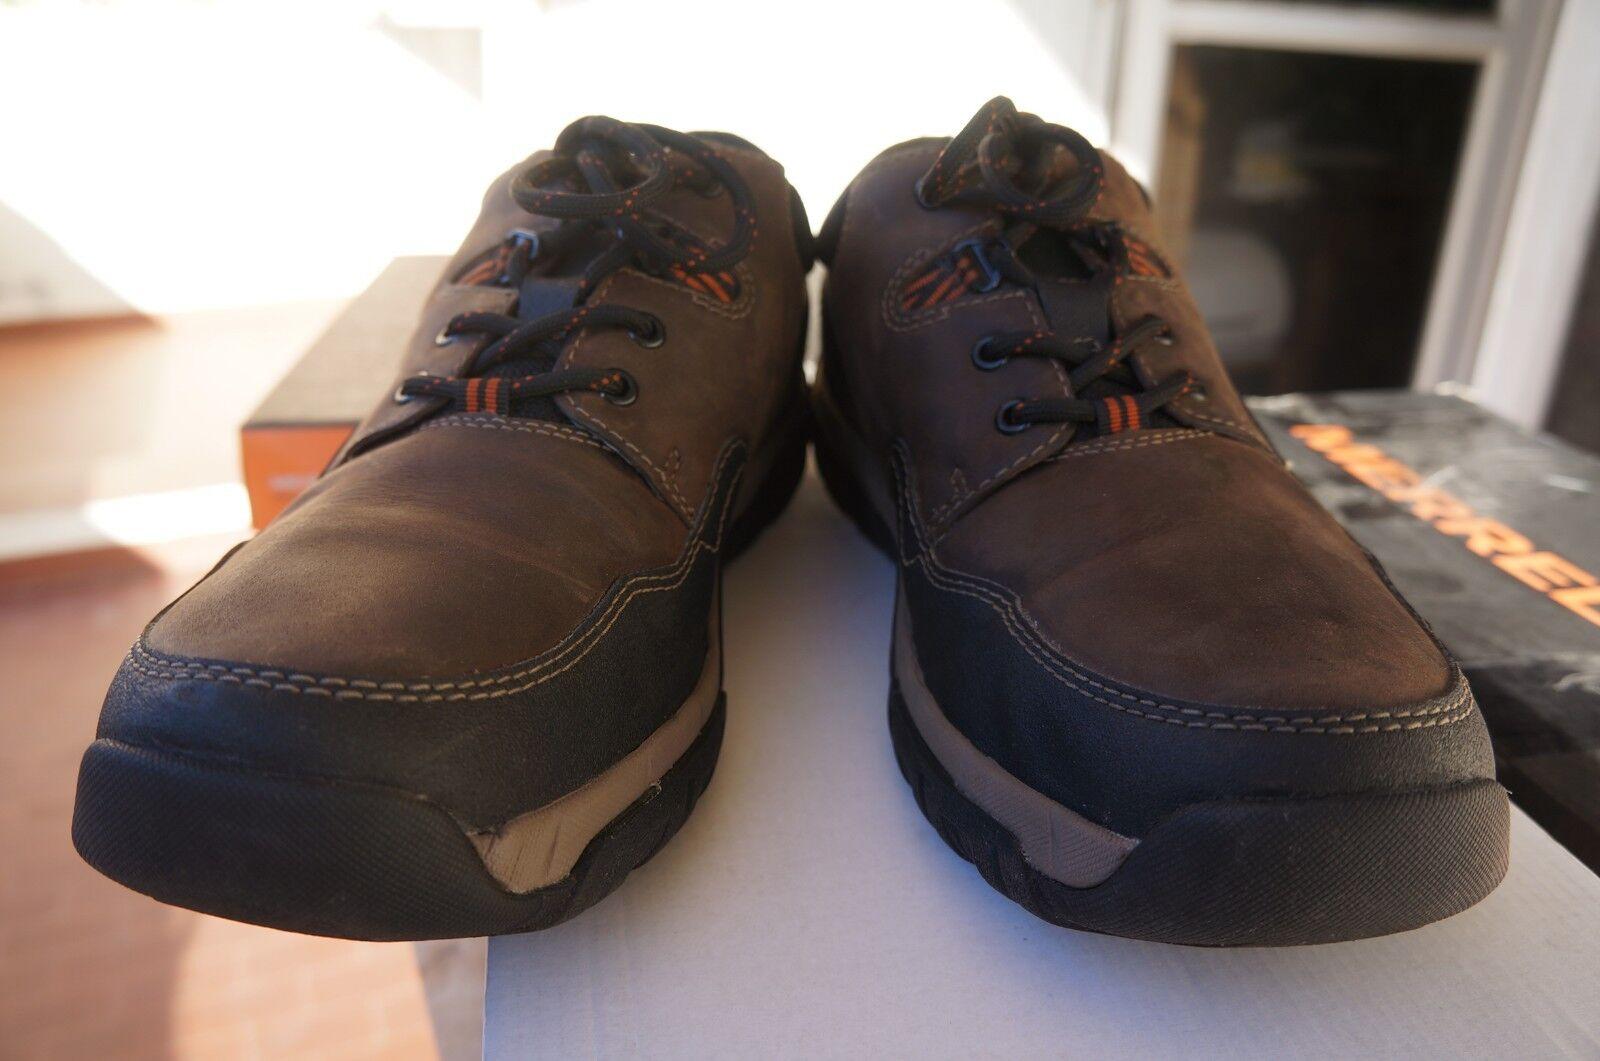 Merrell Annex shoes da Trekking da men, color brown (Dark Earth),  48 -